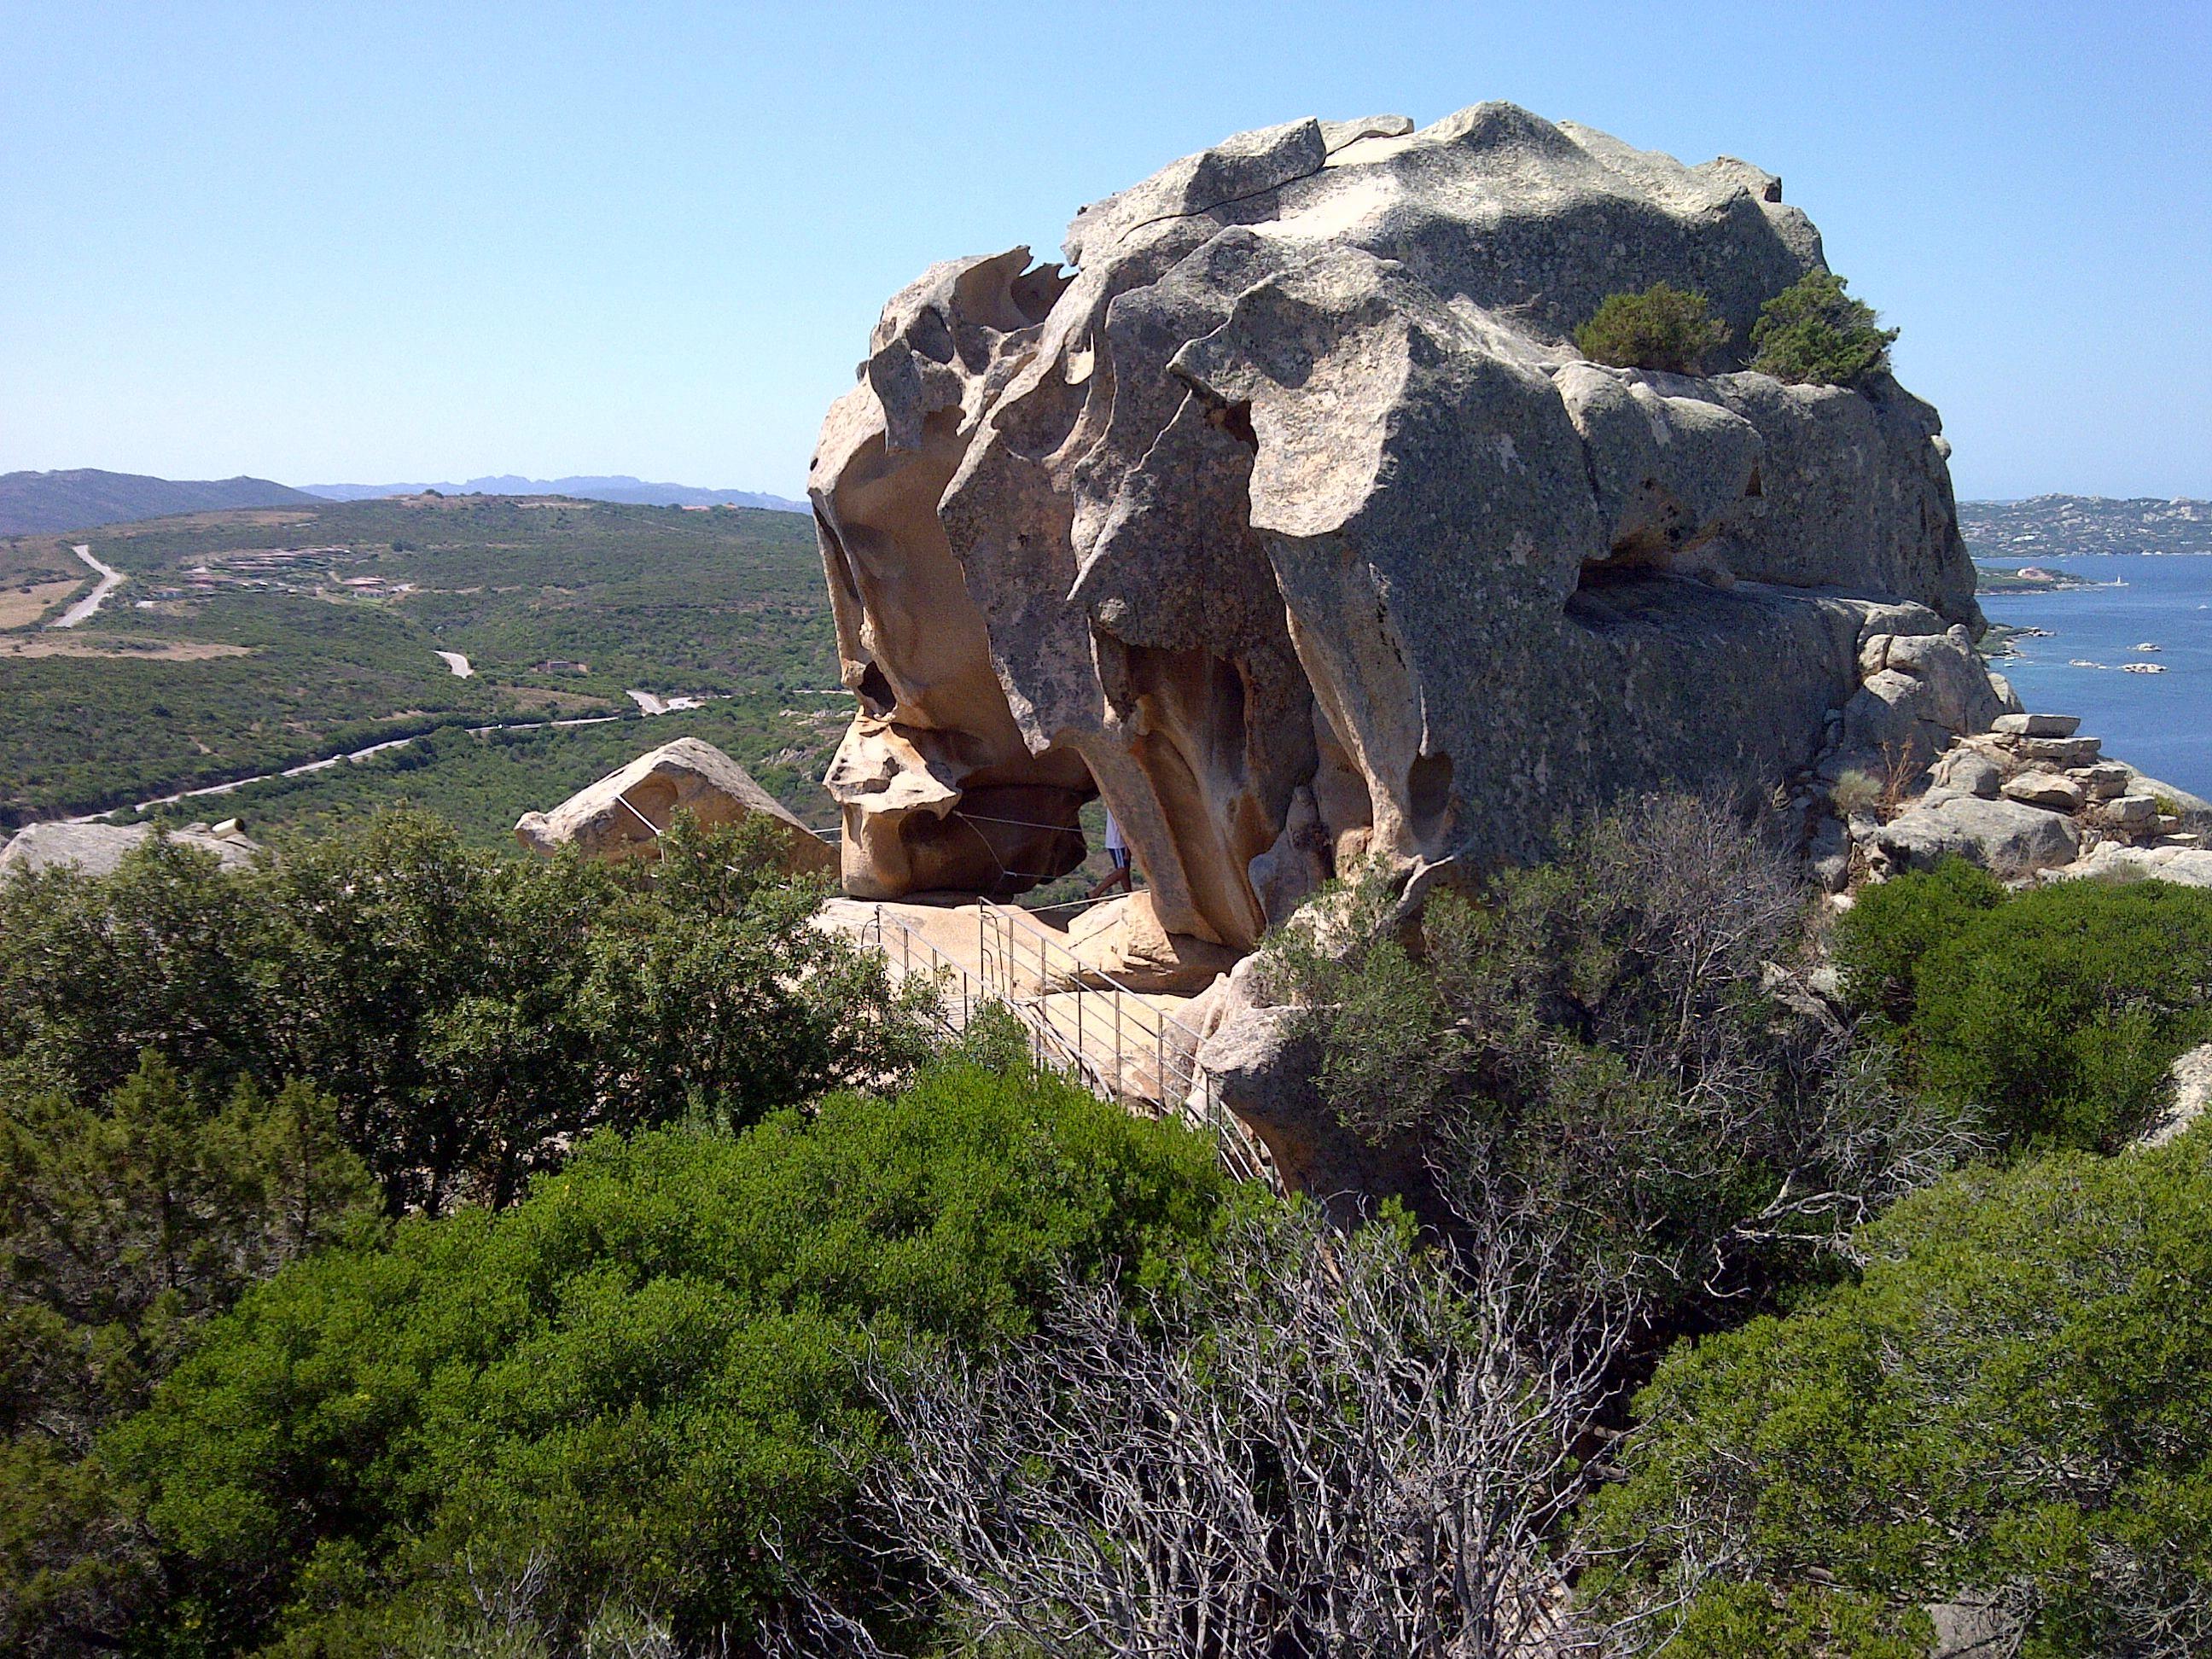 Gambar : pemandangan, laut, pantai, batu, gunung ...